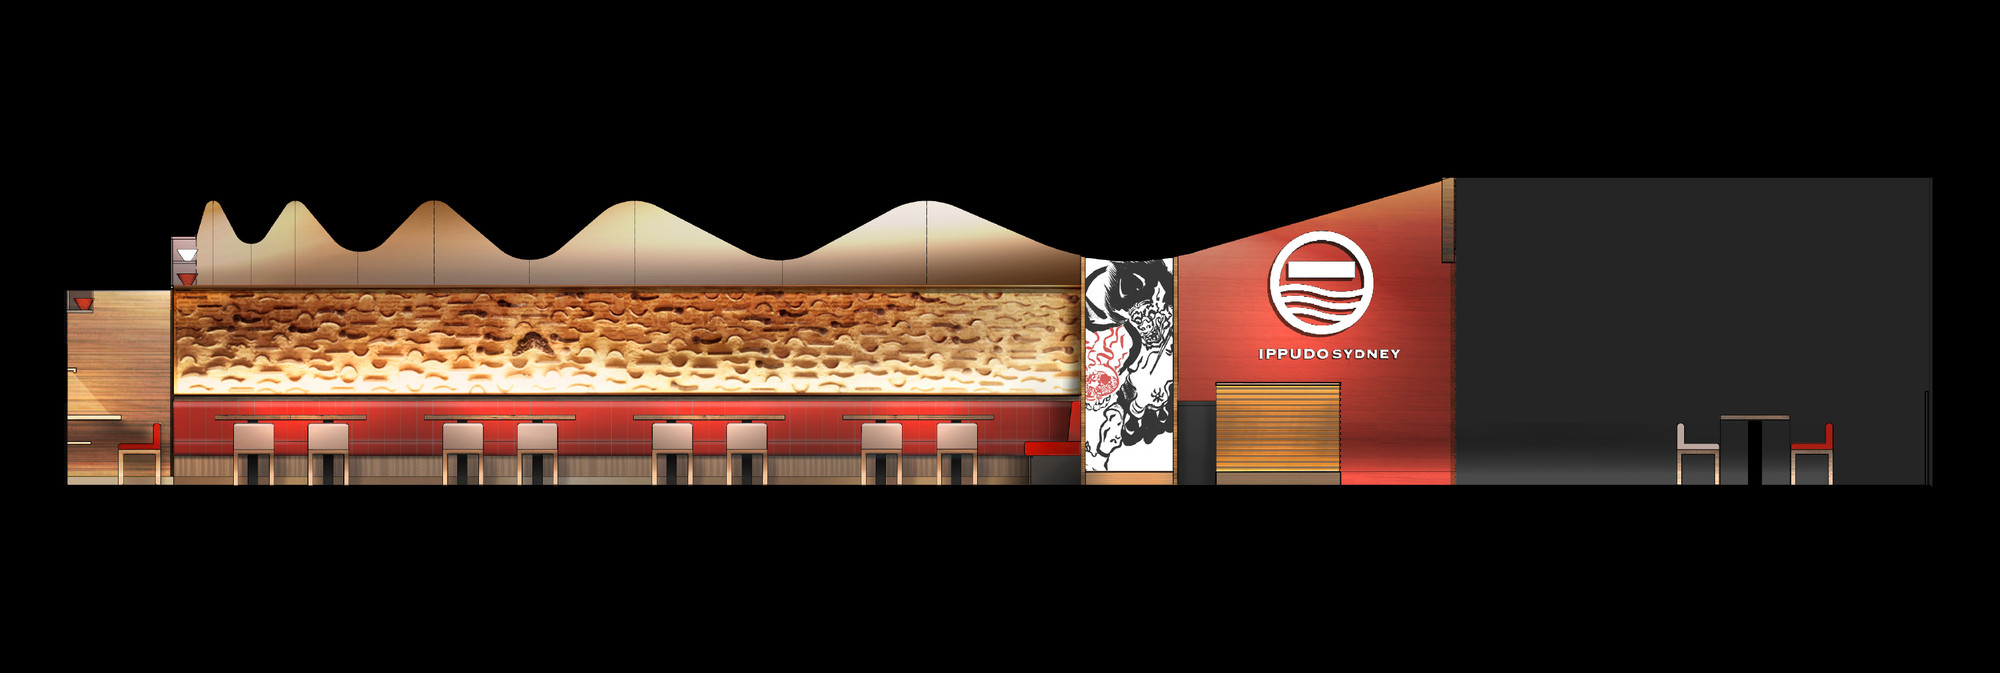 Gallery Of Ippudo Sydney Koichi Takada Architects 10